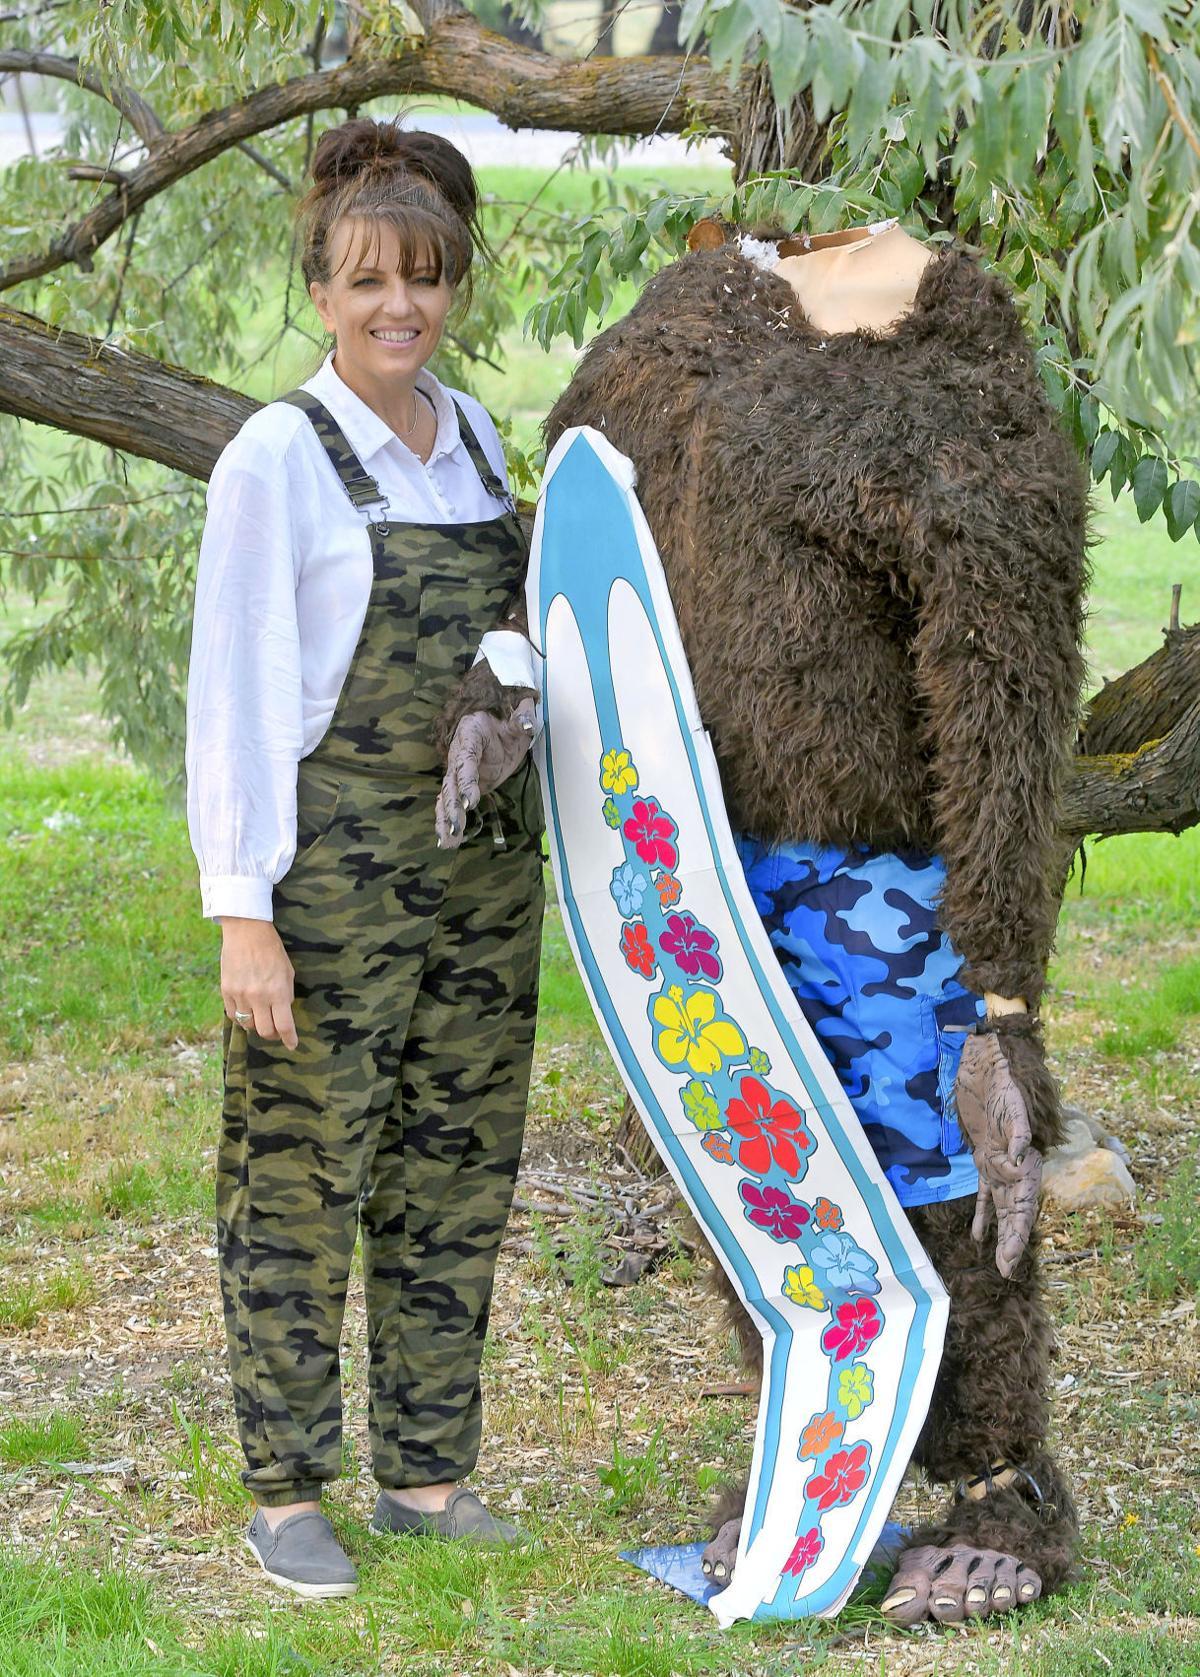 Big feet, no head: Community raises funds for Benson family's decapitated Sasquatch